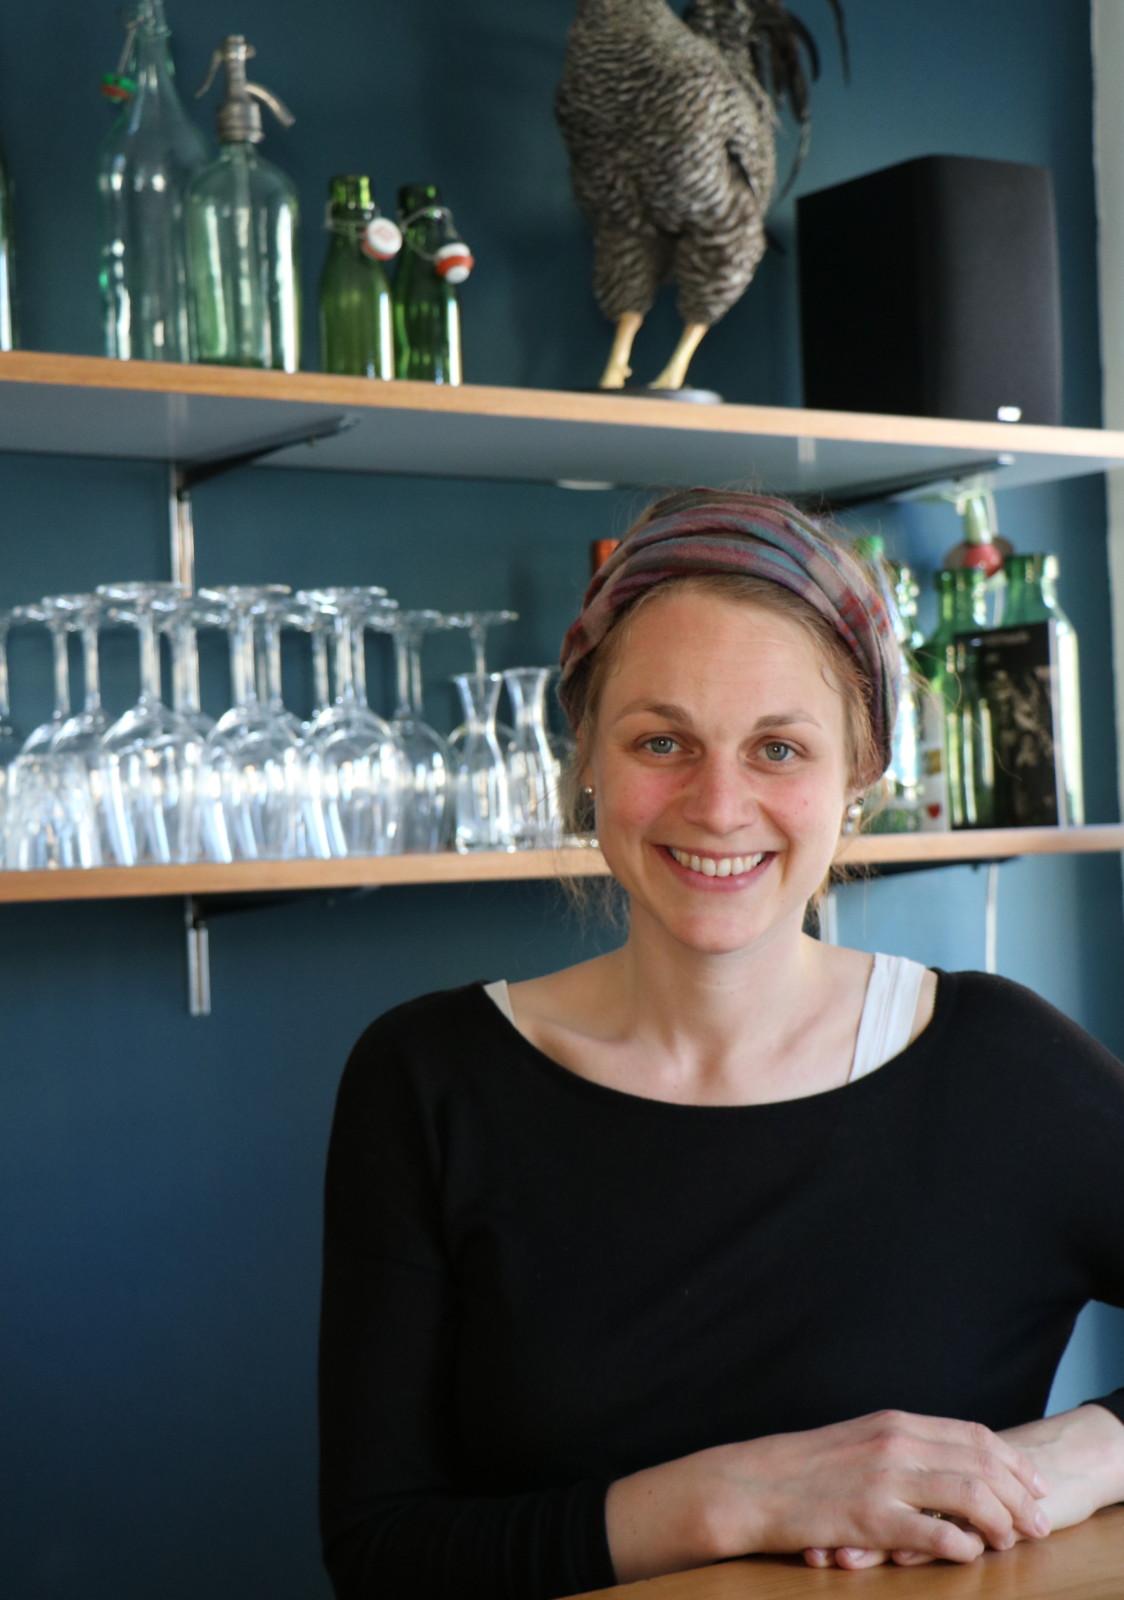 Slow Food Youth-Präsidentin Laura Schälchli